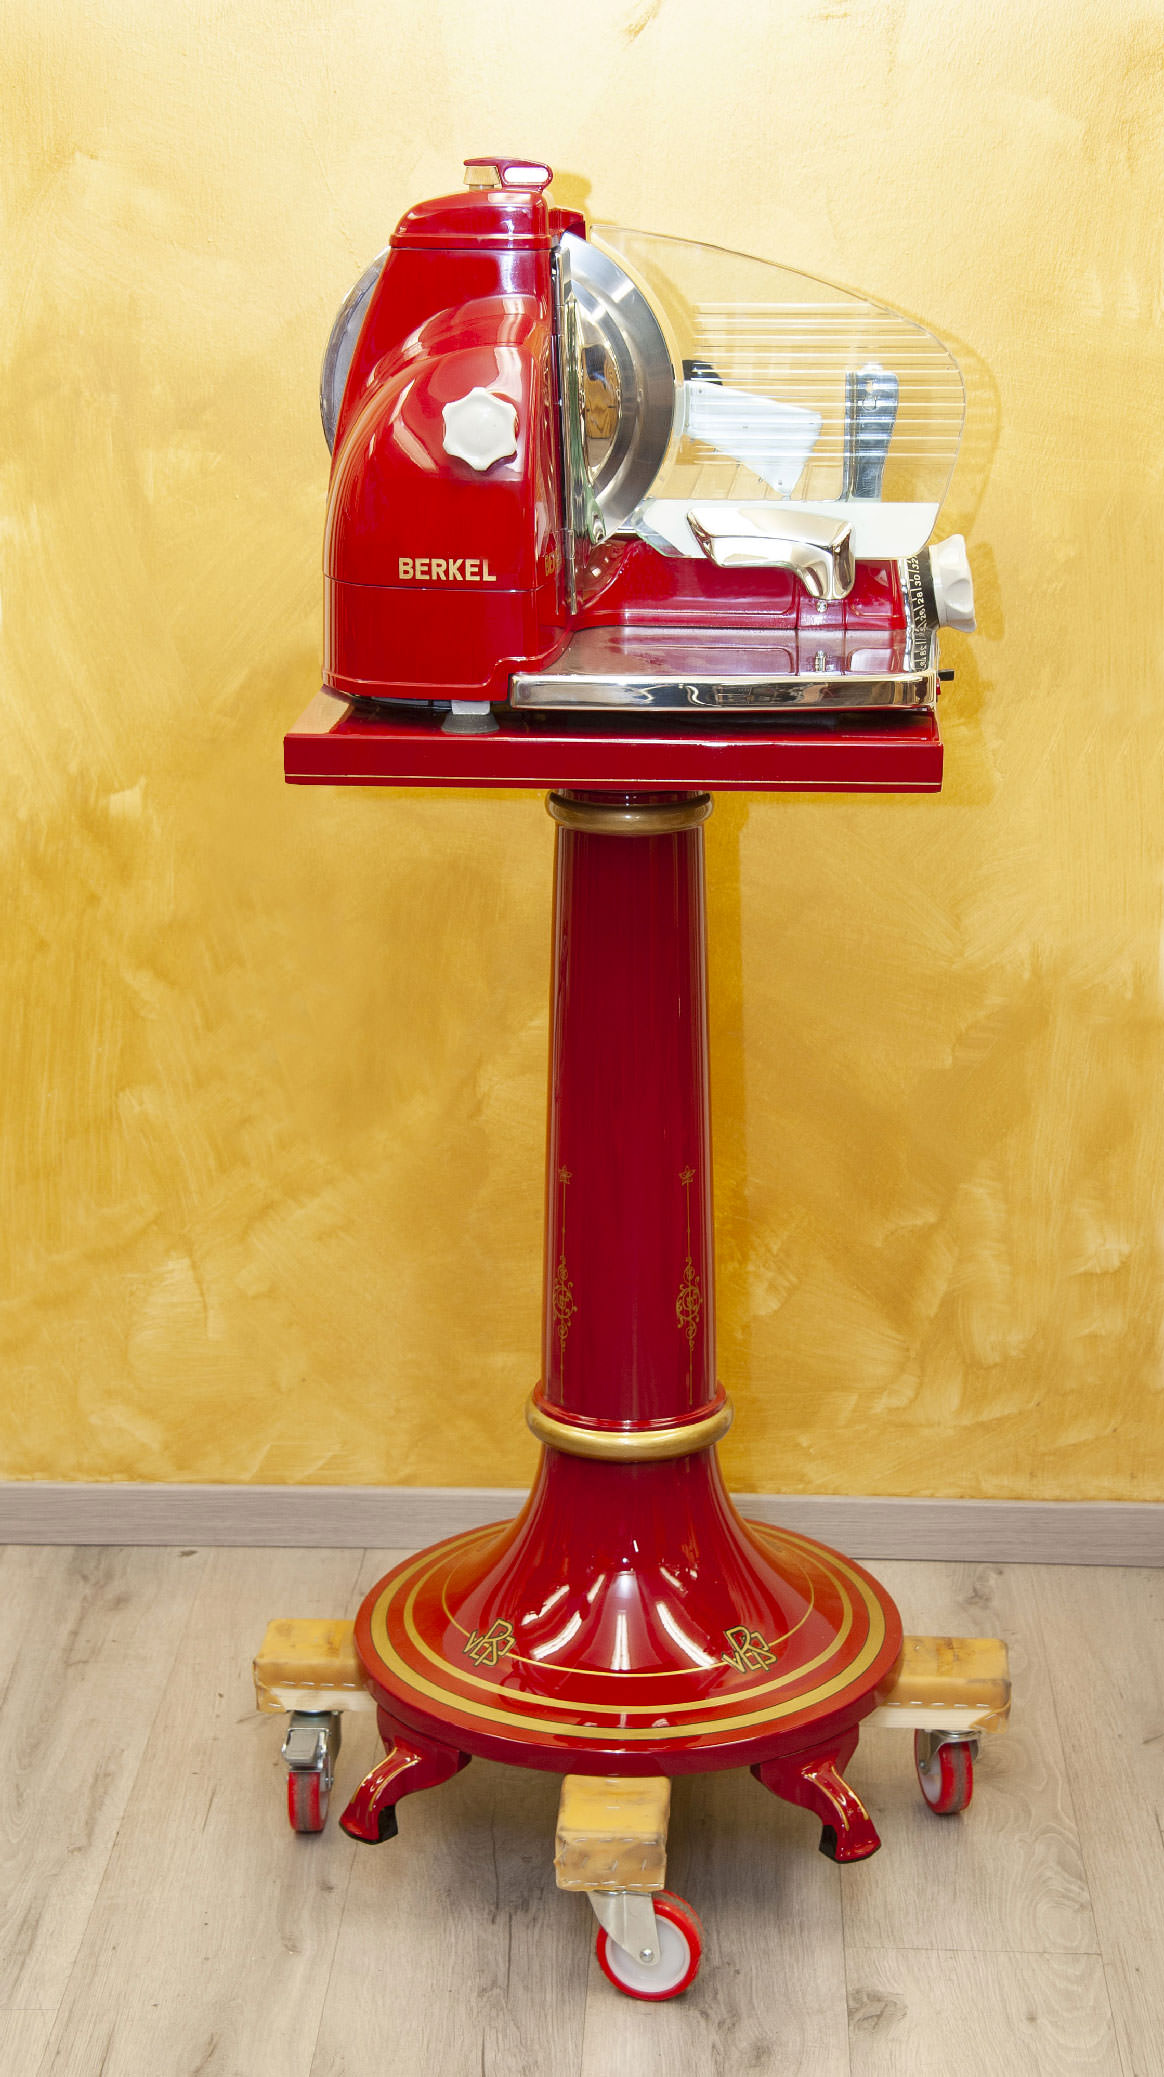 Berkel eletric slicer model 836 red